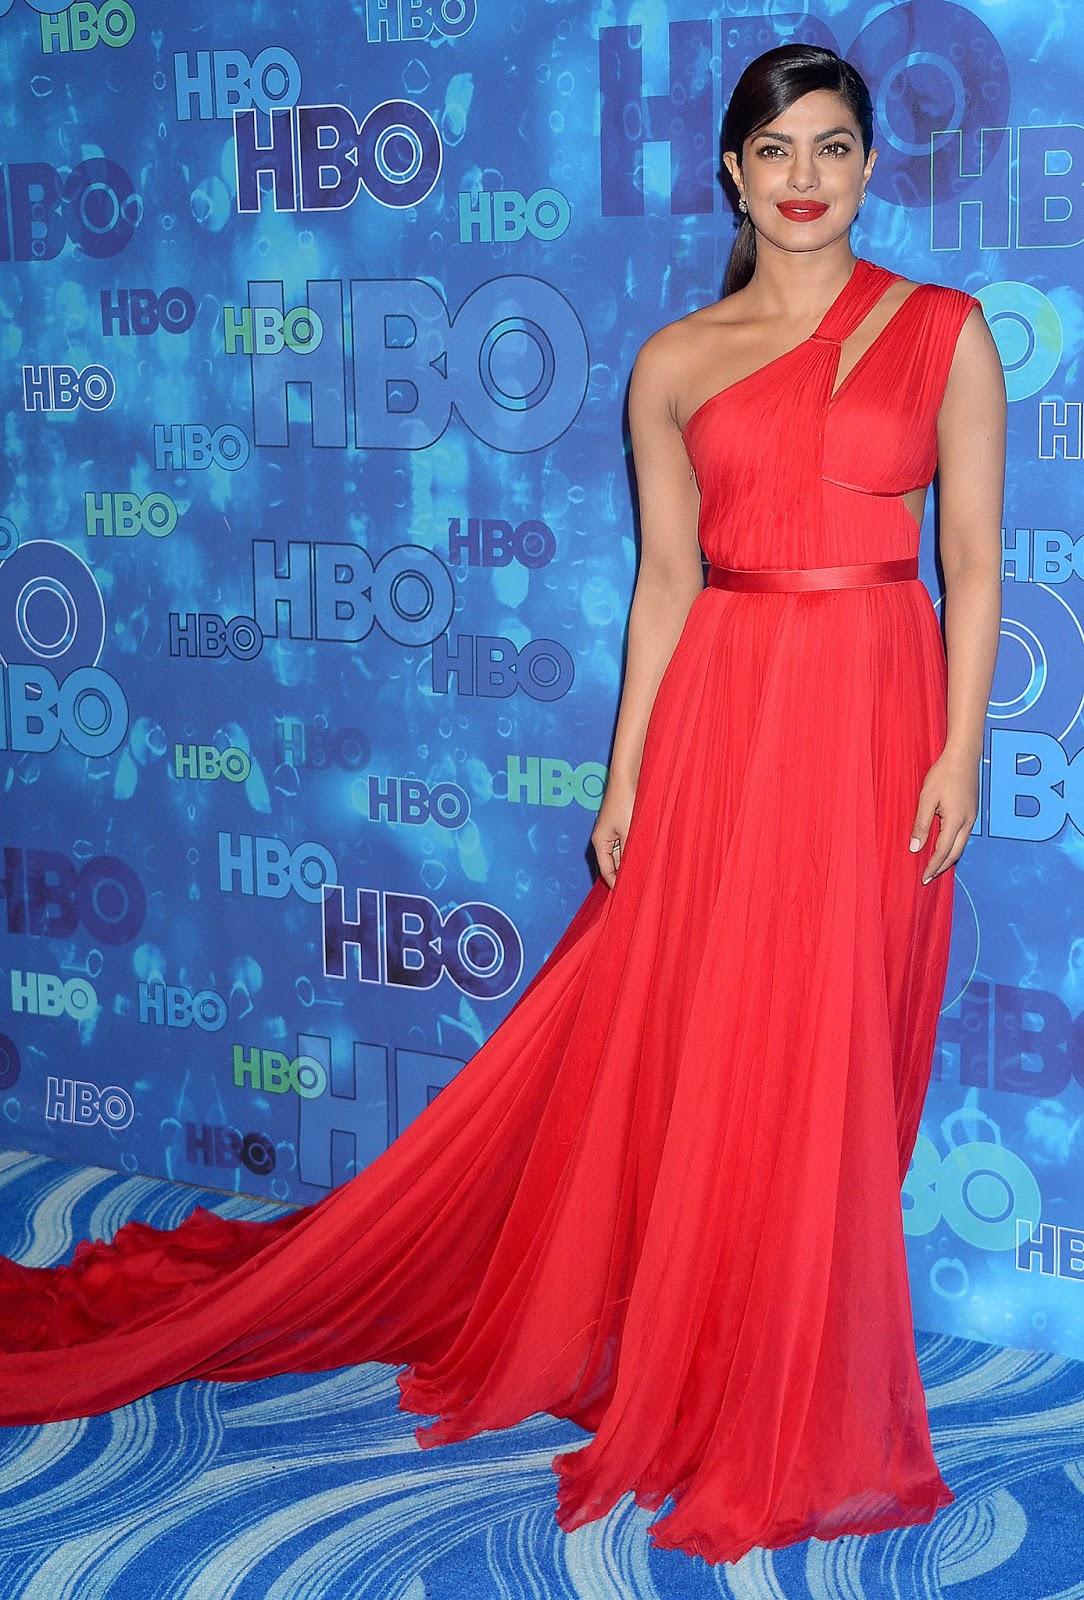 Priyanka Chopra Looks Stunning In Red Dress At Hbos Post -5247